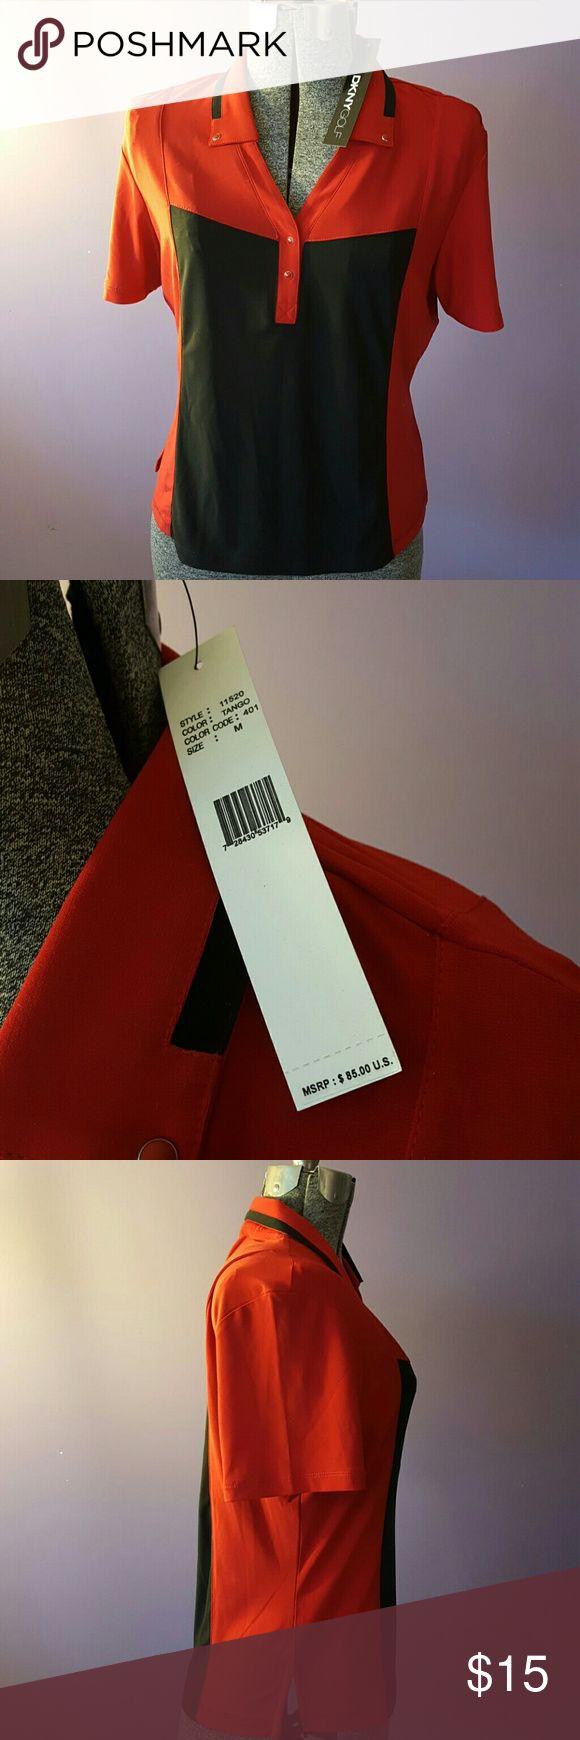 DKNY Women's Golf Shirt Poly/Spandex blend. Side vents.  Never worn. DKNY Tops Button Down Shirts